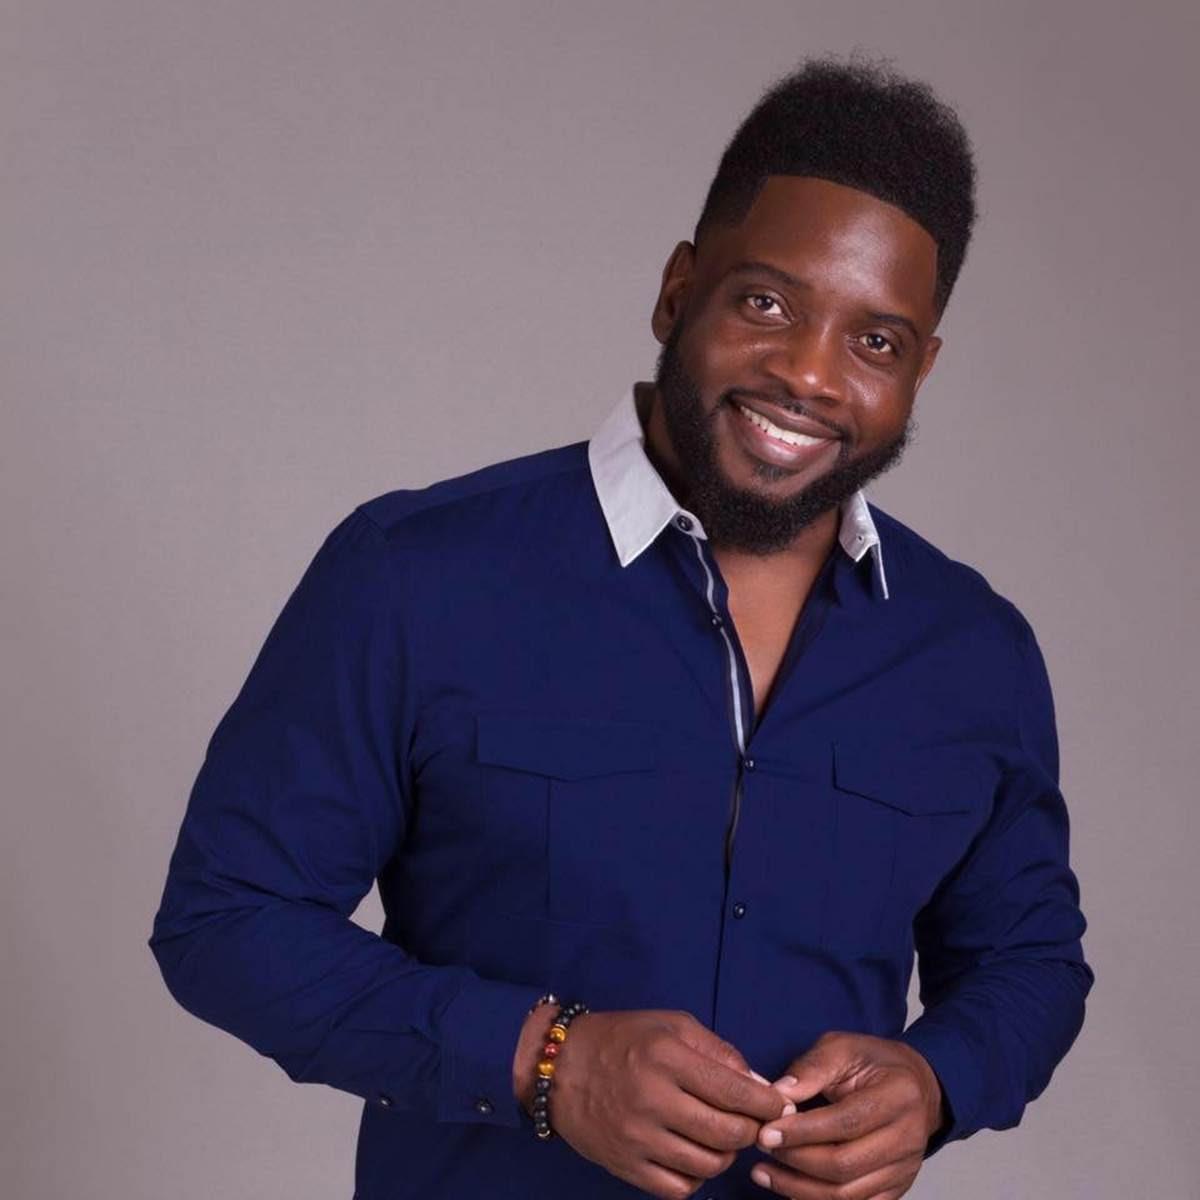 pastor botiwa jackson image - gospel stage - host #2 7.27.jpg